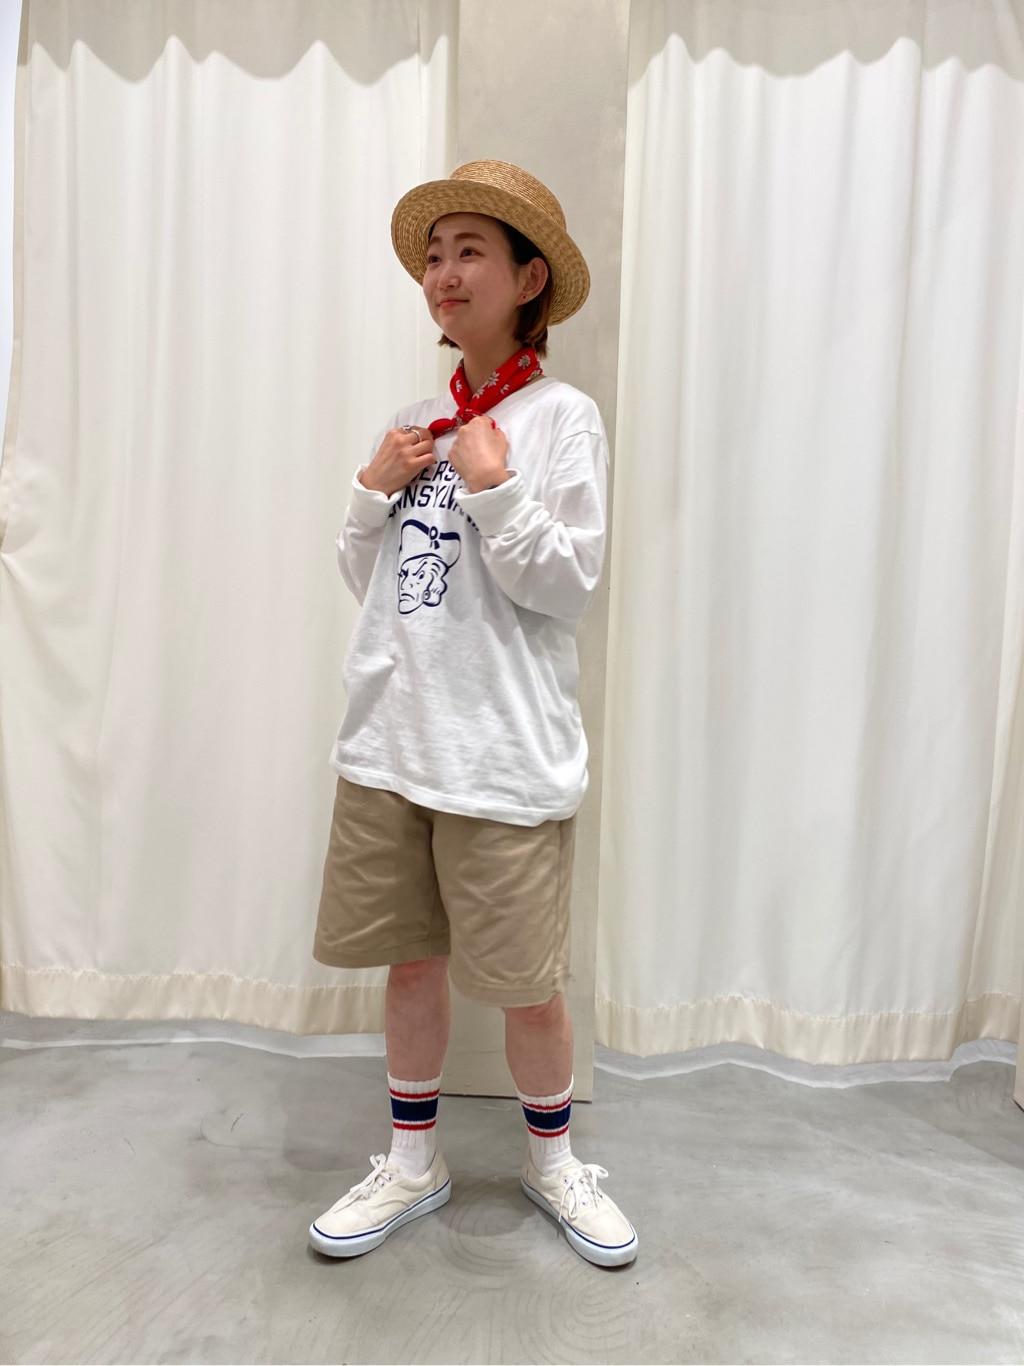 - CHILD WOMAN CHILD WOMAN , PAR ICI 東京スカイツリータウン・ソラマチ 身長:150cm 2020.09.09